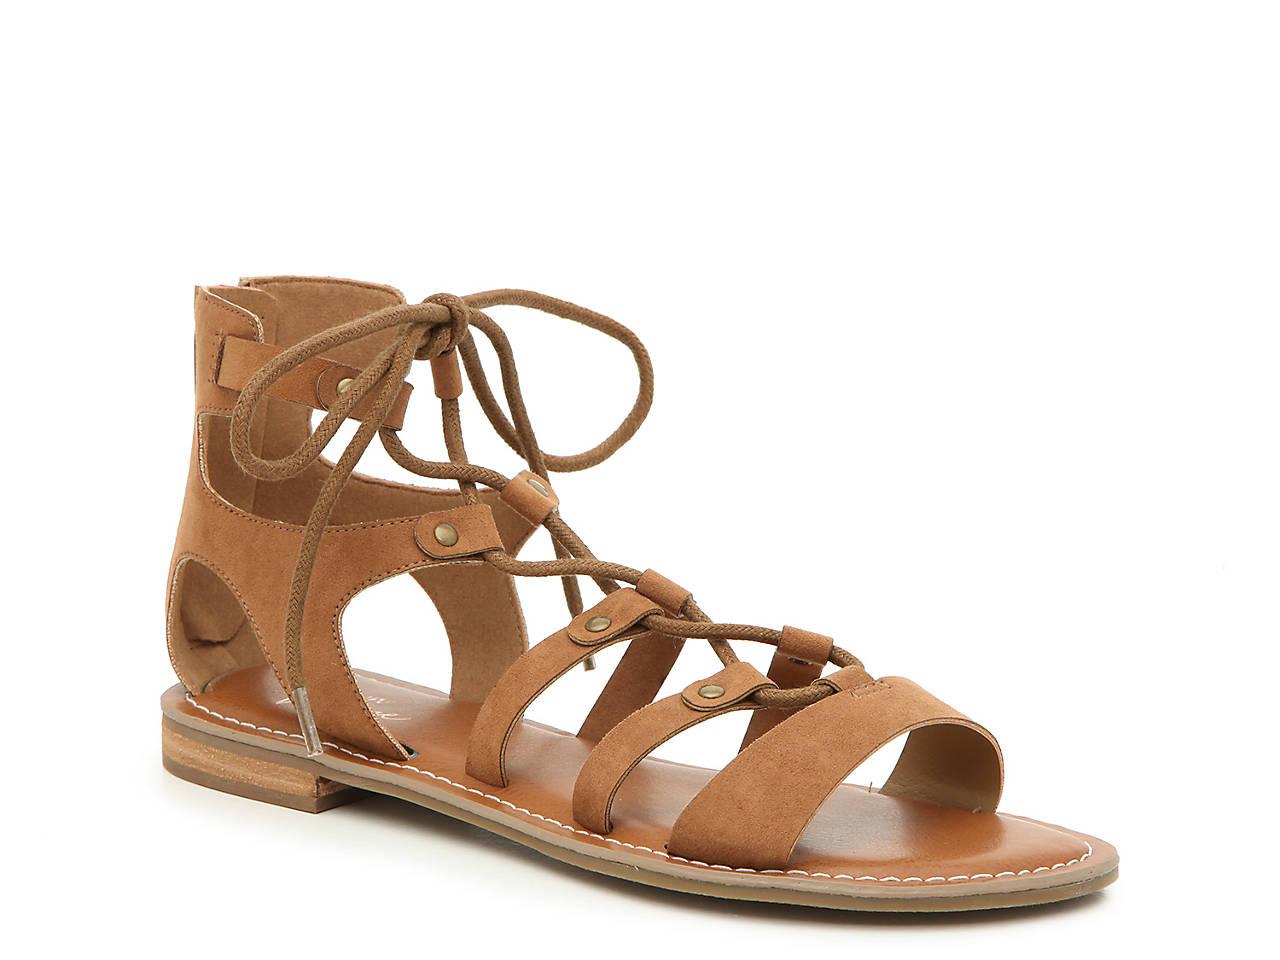 6c8377695d5c Crown Vintage Regina Gladiator Sandal Women s Shoes